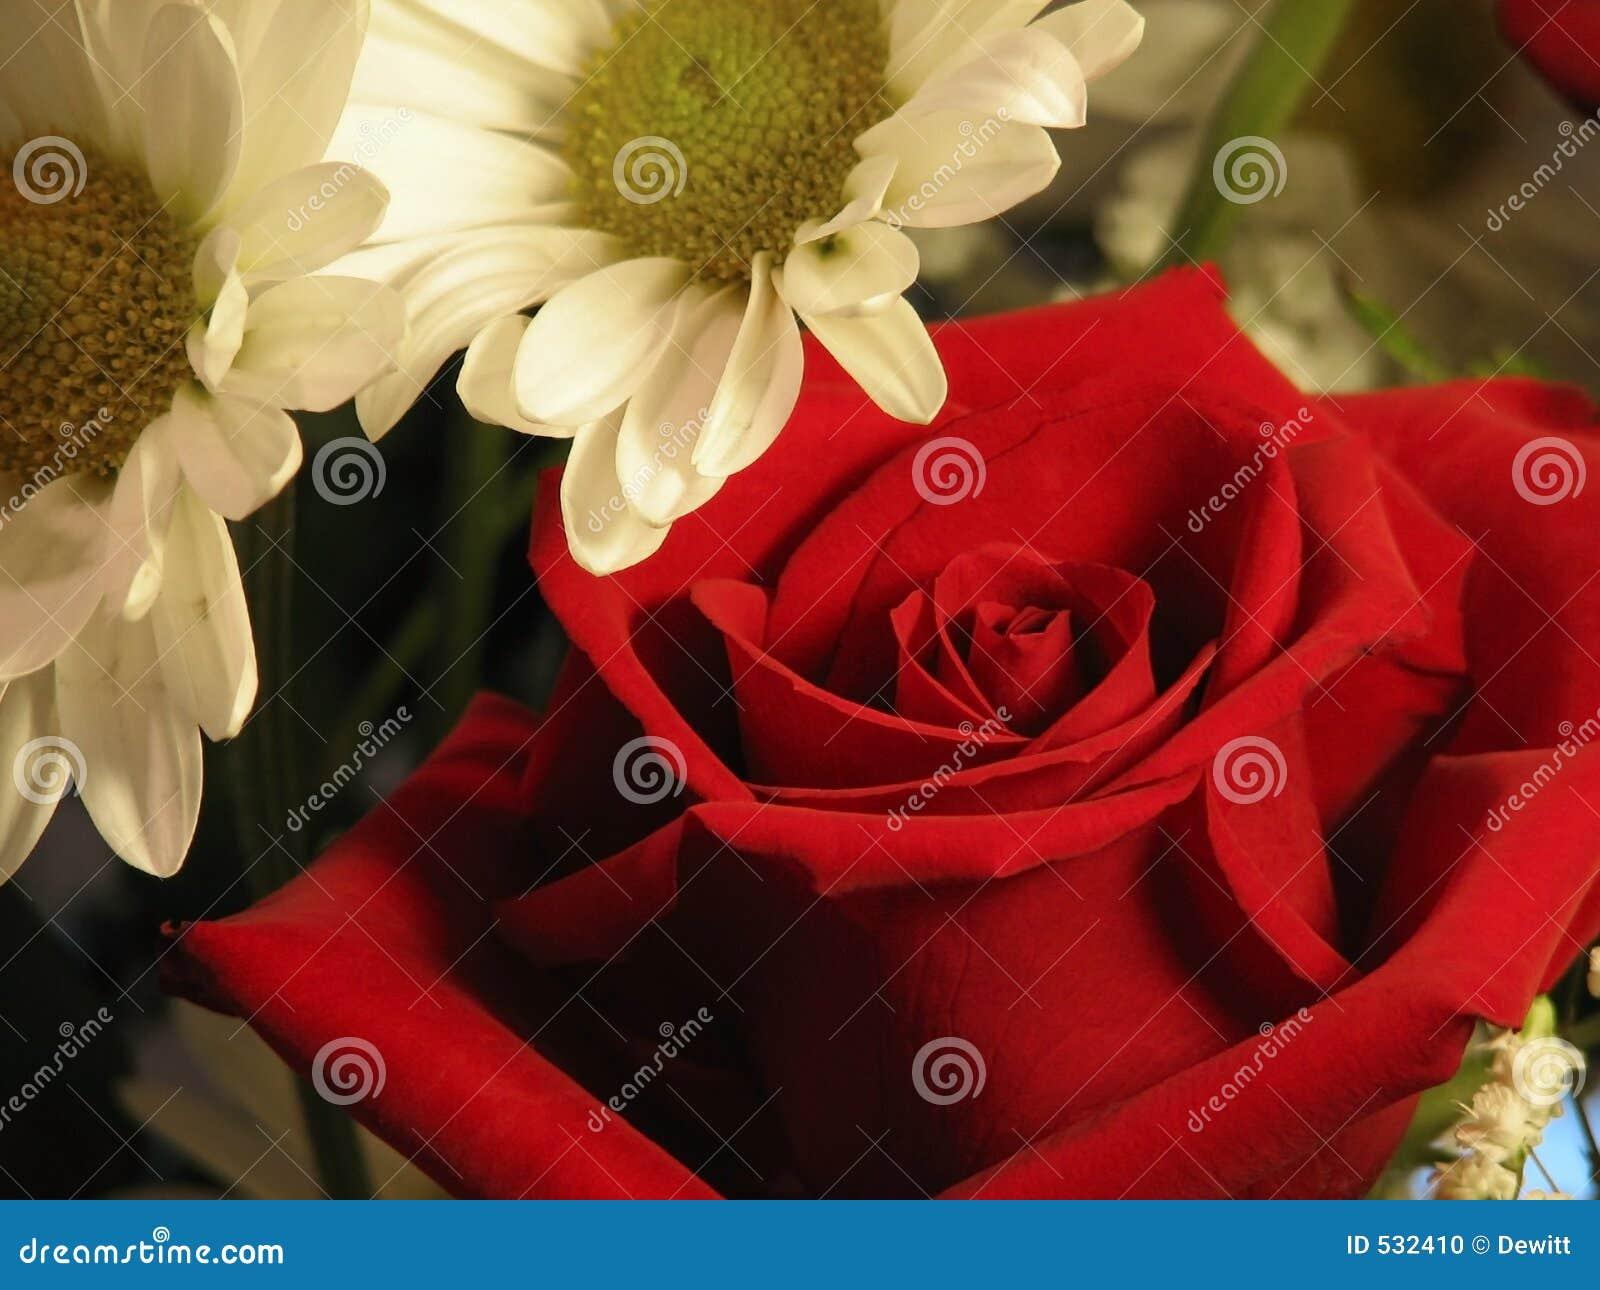 Download 雏菊上升了 库存照片. 图片 包括有 雏菊, 文本, beauvoir, 开花, 春天, 浪漫, 植物群, 绽放 - 532410